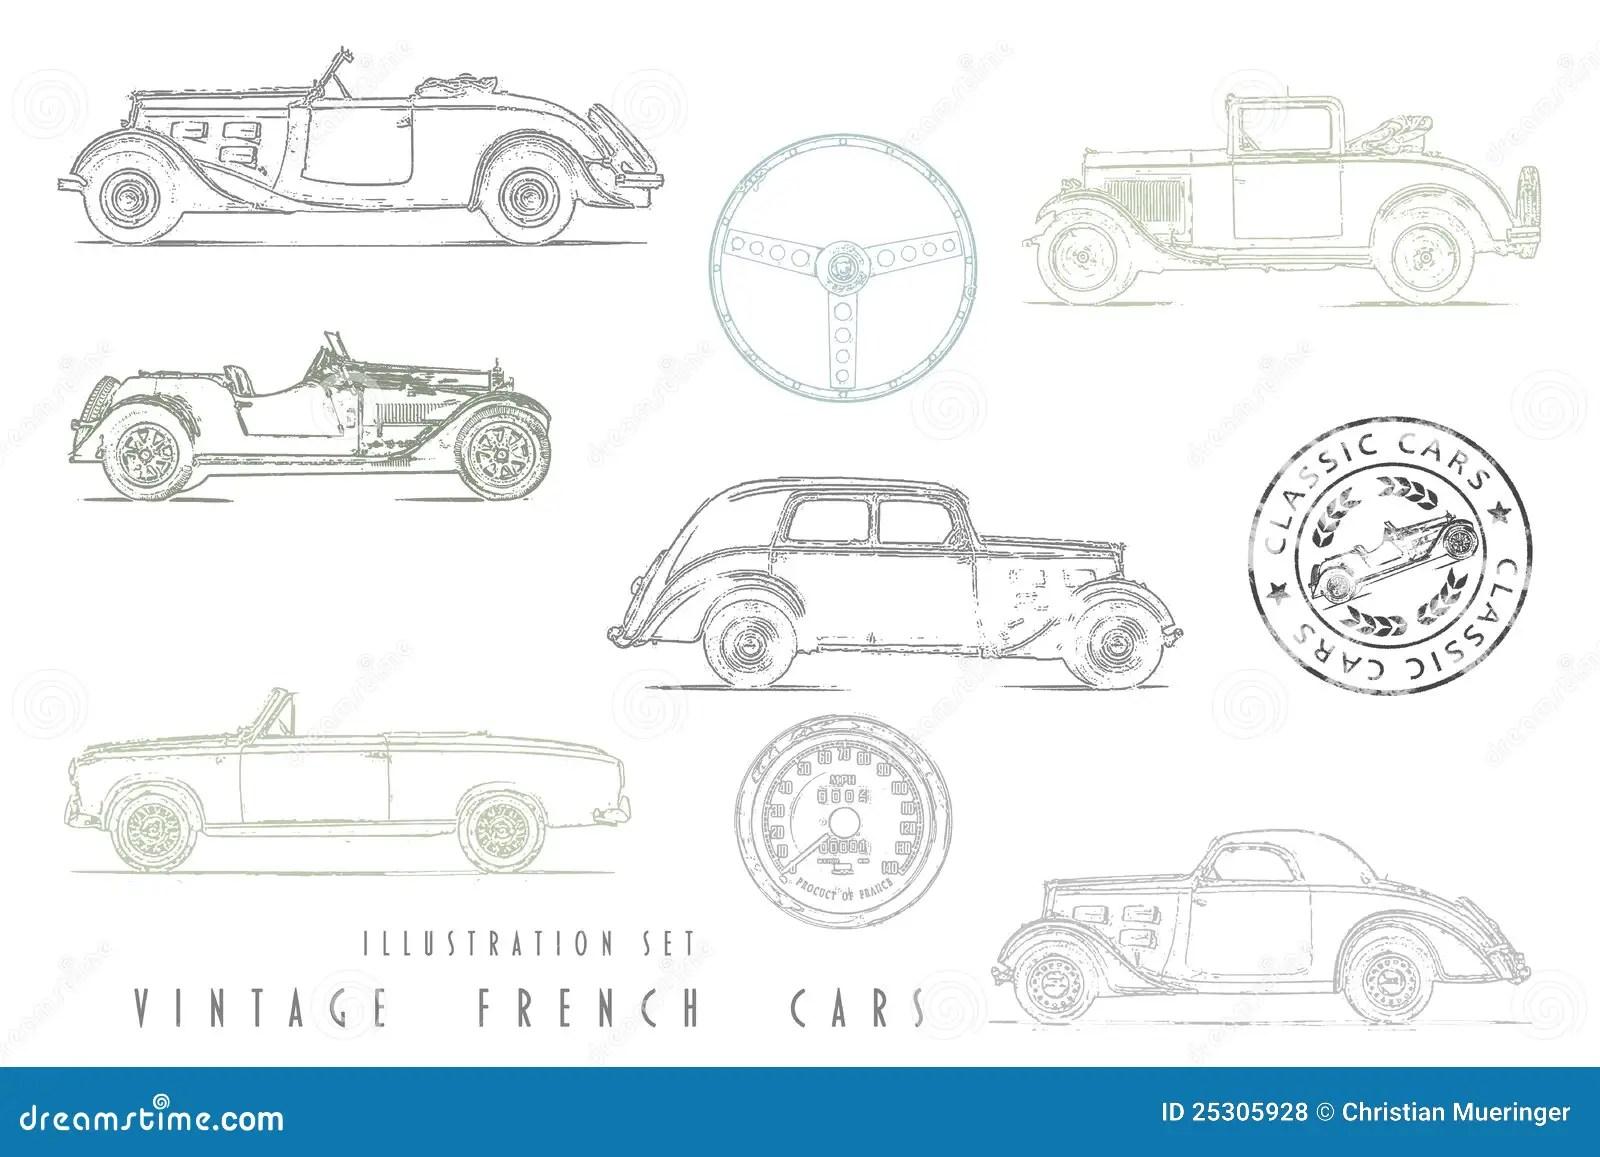 Illustration Of Cars Recreational Vehicles Camper Vans